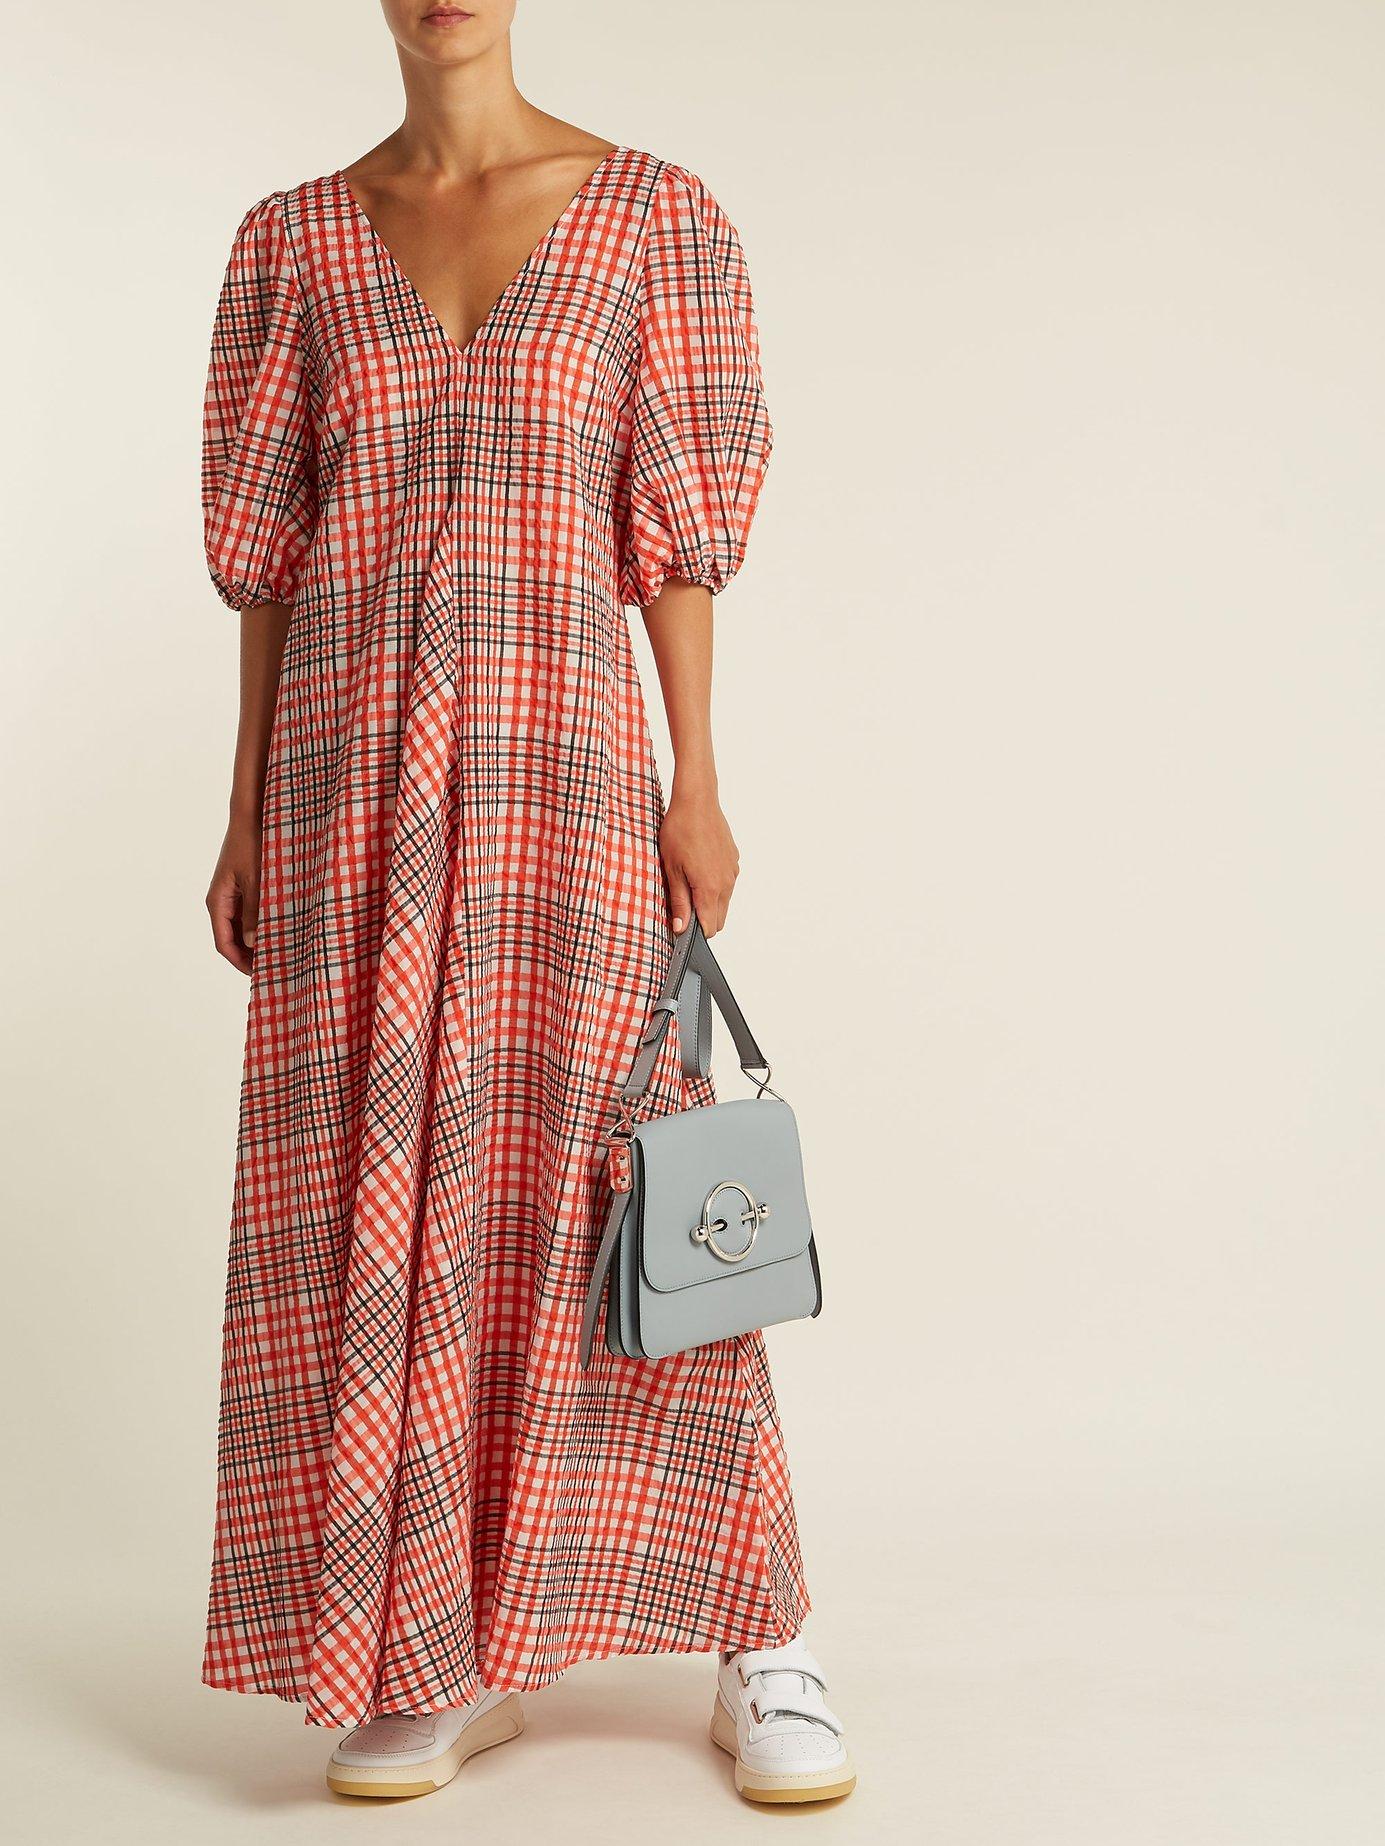 Charron puff-sleeve gingham dress by Ganni